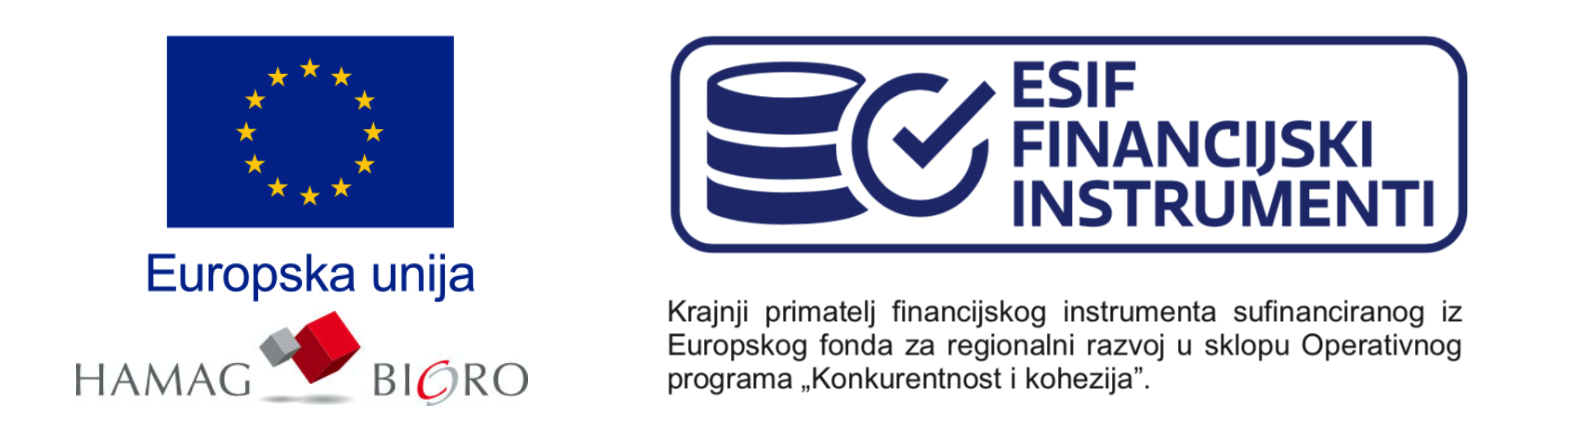 ESIF-EU-HAMAG-BICRO